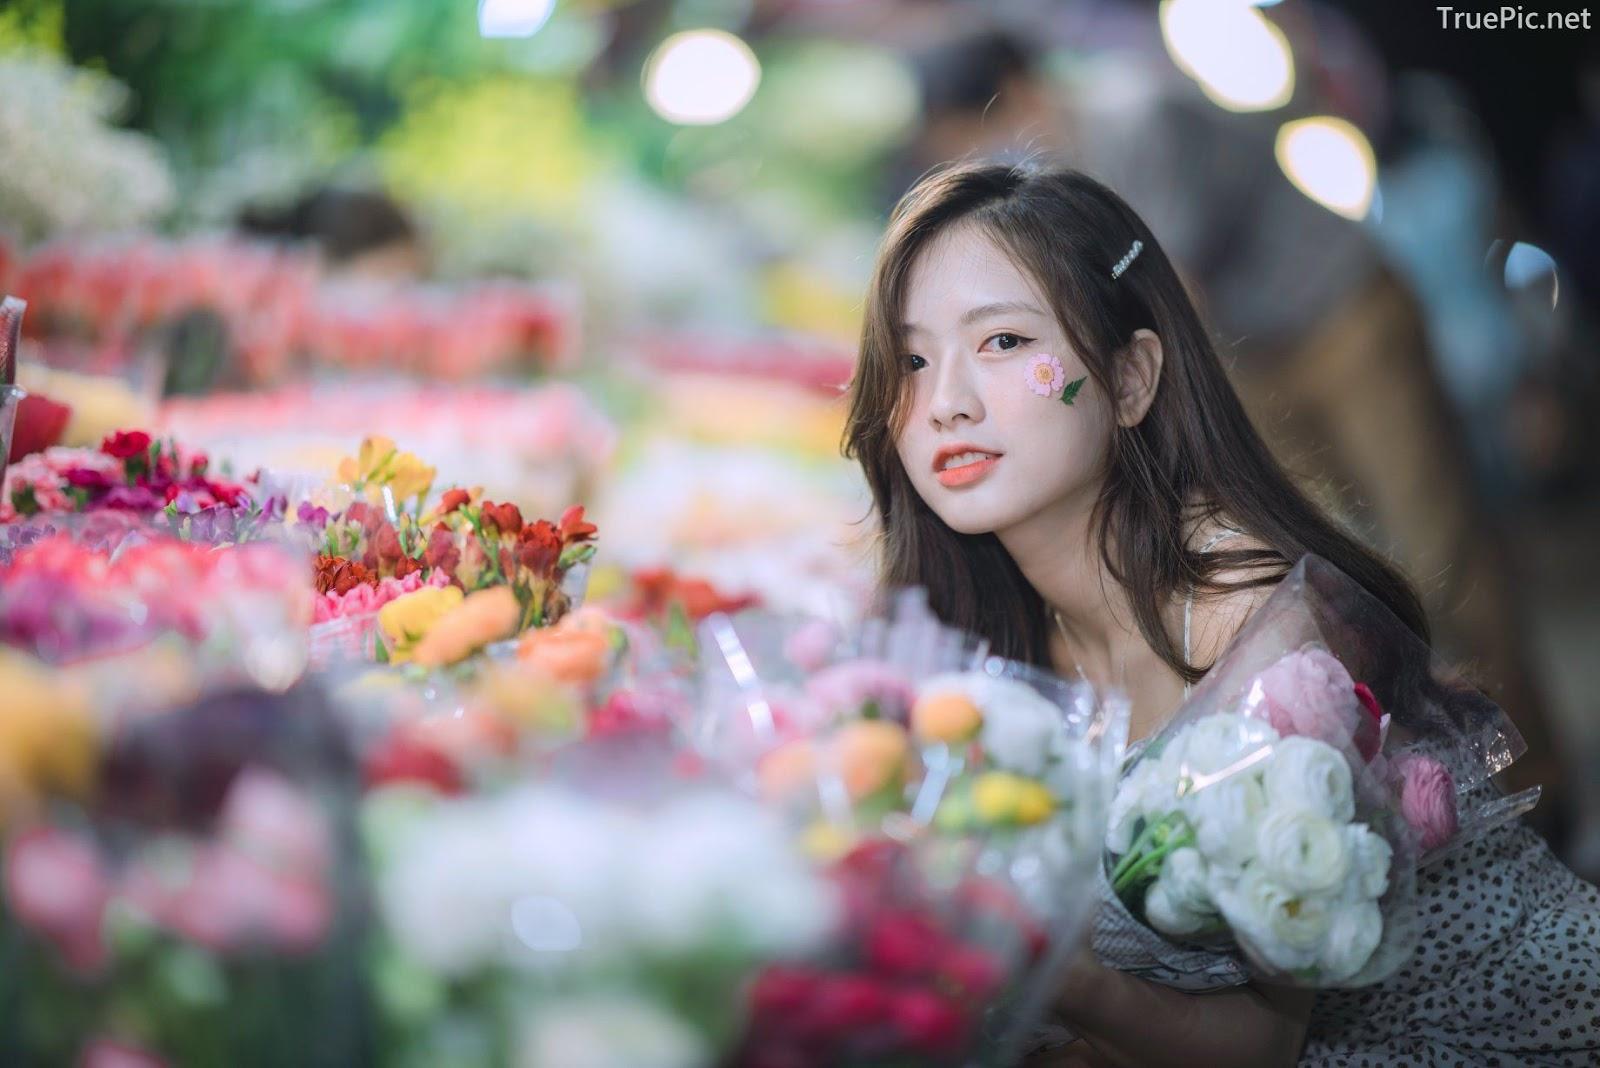 Vietnamese Hot Girl Linh Hoai - Strolling on the flower street - TruePic.net - Picture 5